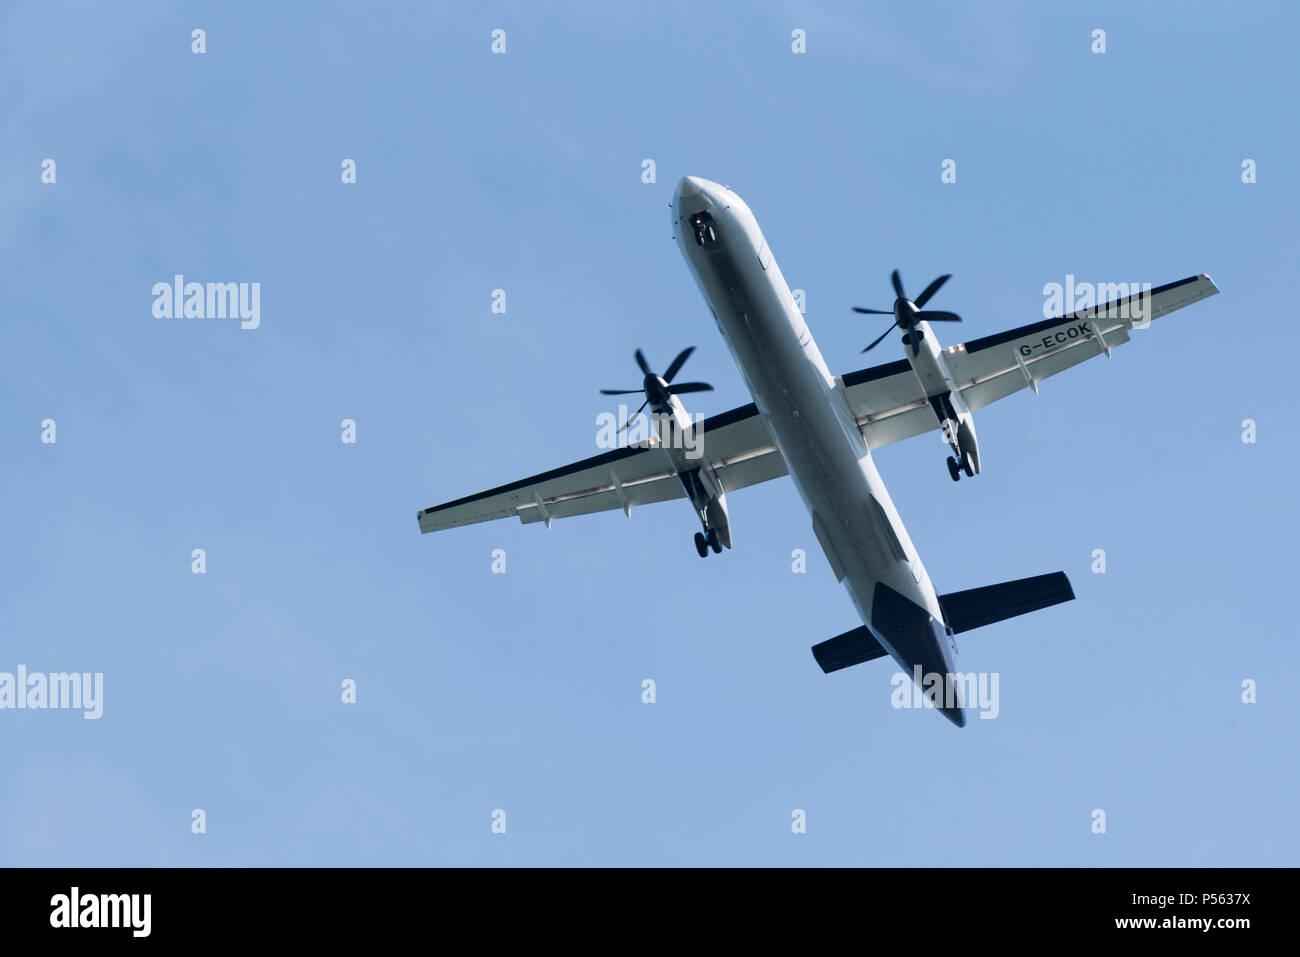 A Bombardier Dash 8 passenger aircraft on finals to land. Southampton UK - Stock Image